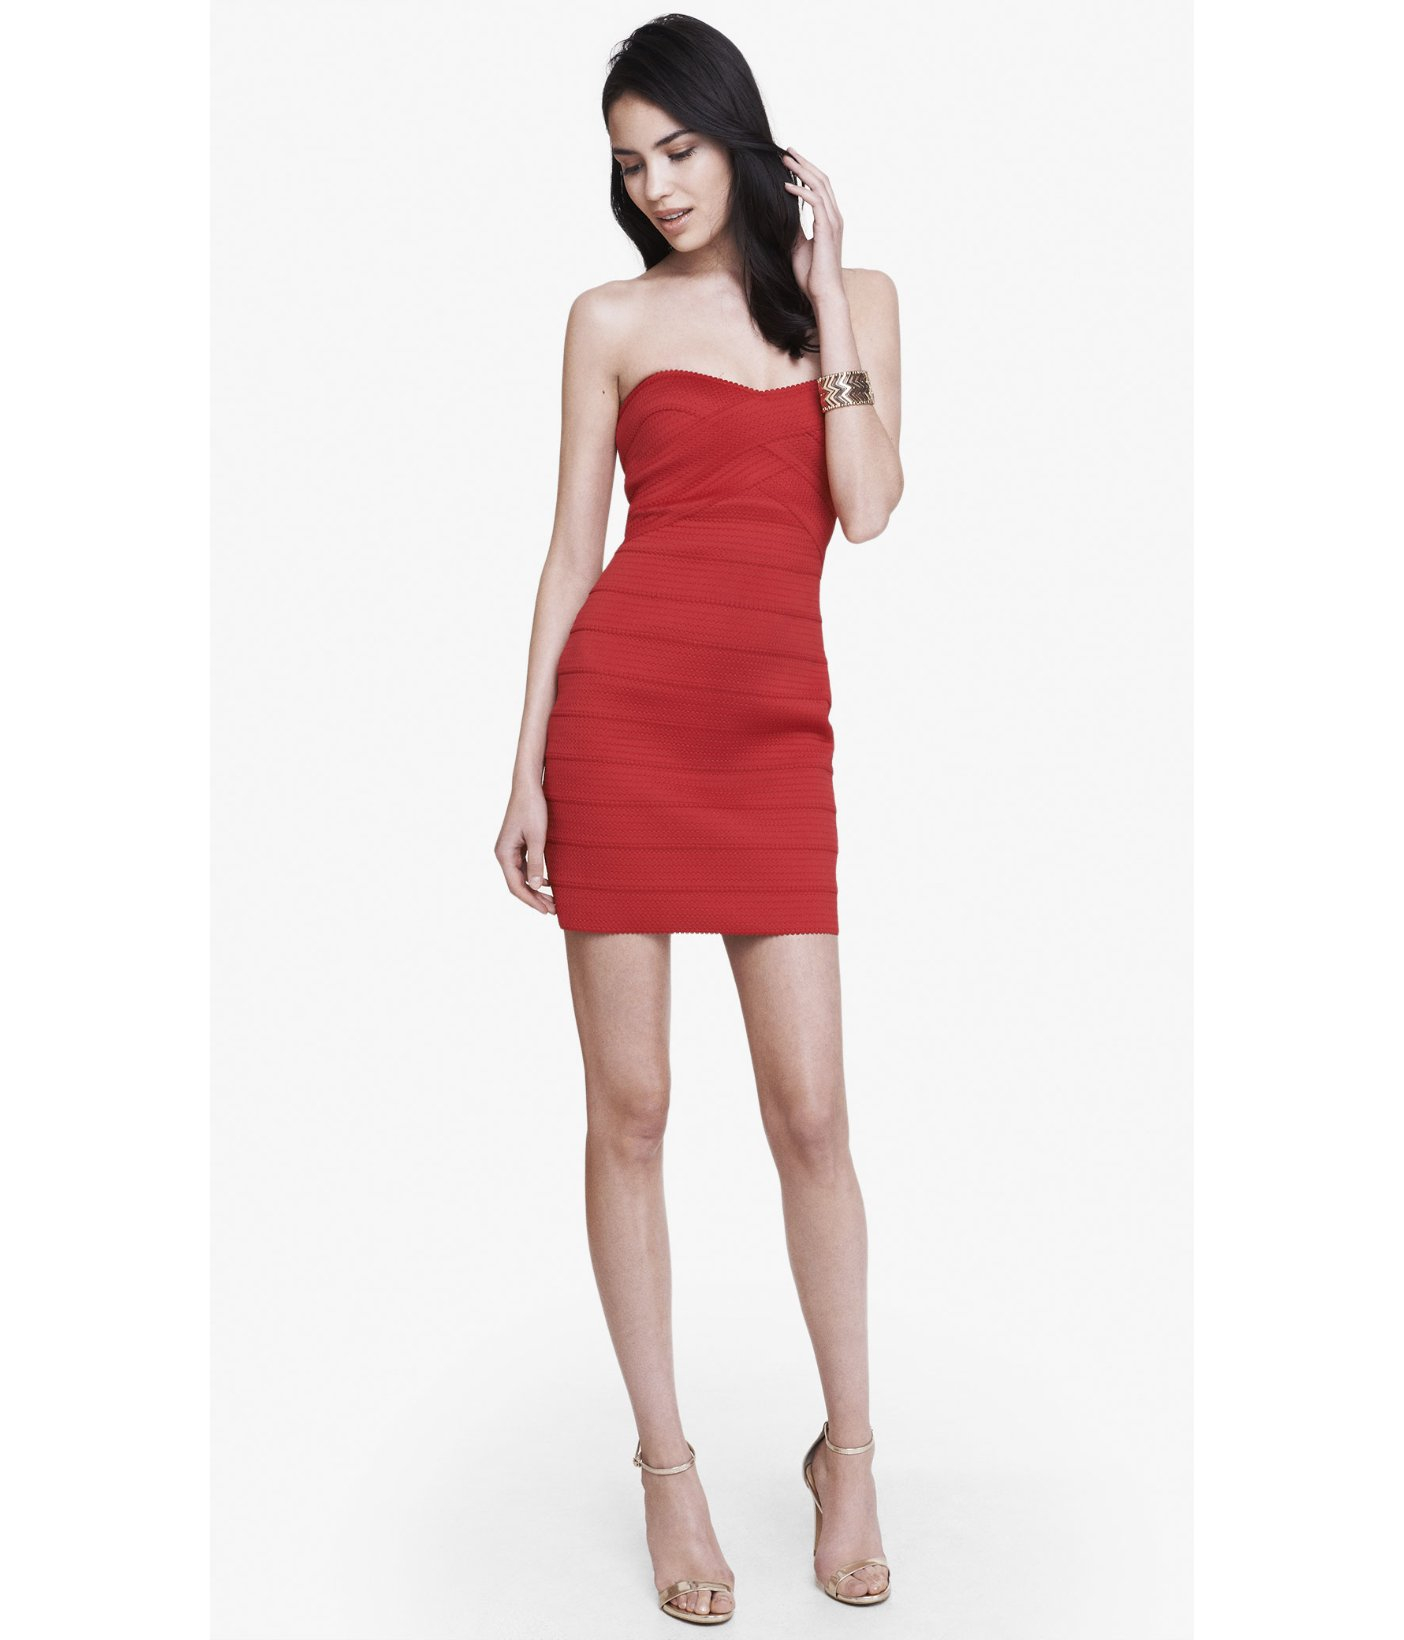 lyst express strapless bandage mini dress in red. Black Bedroom Furniture Sets. Home Design Ideas